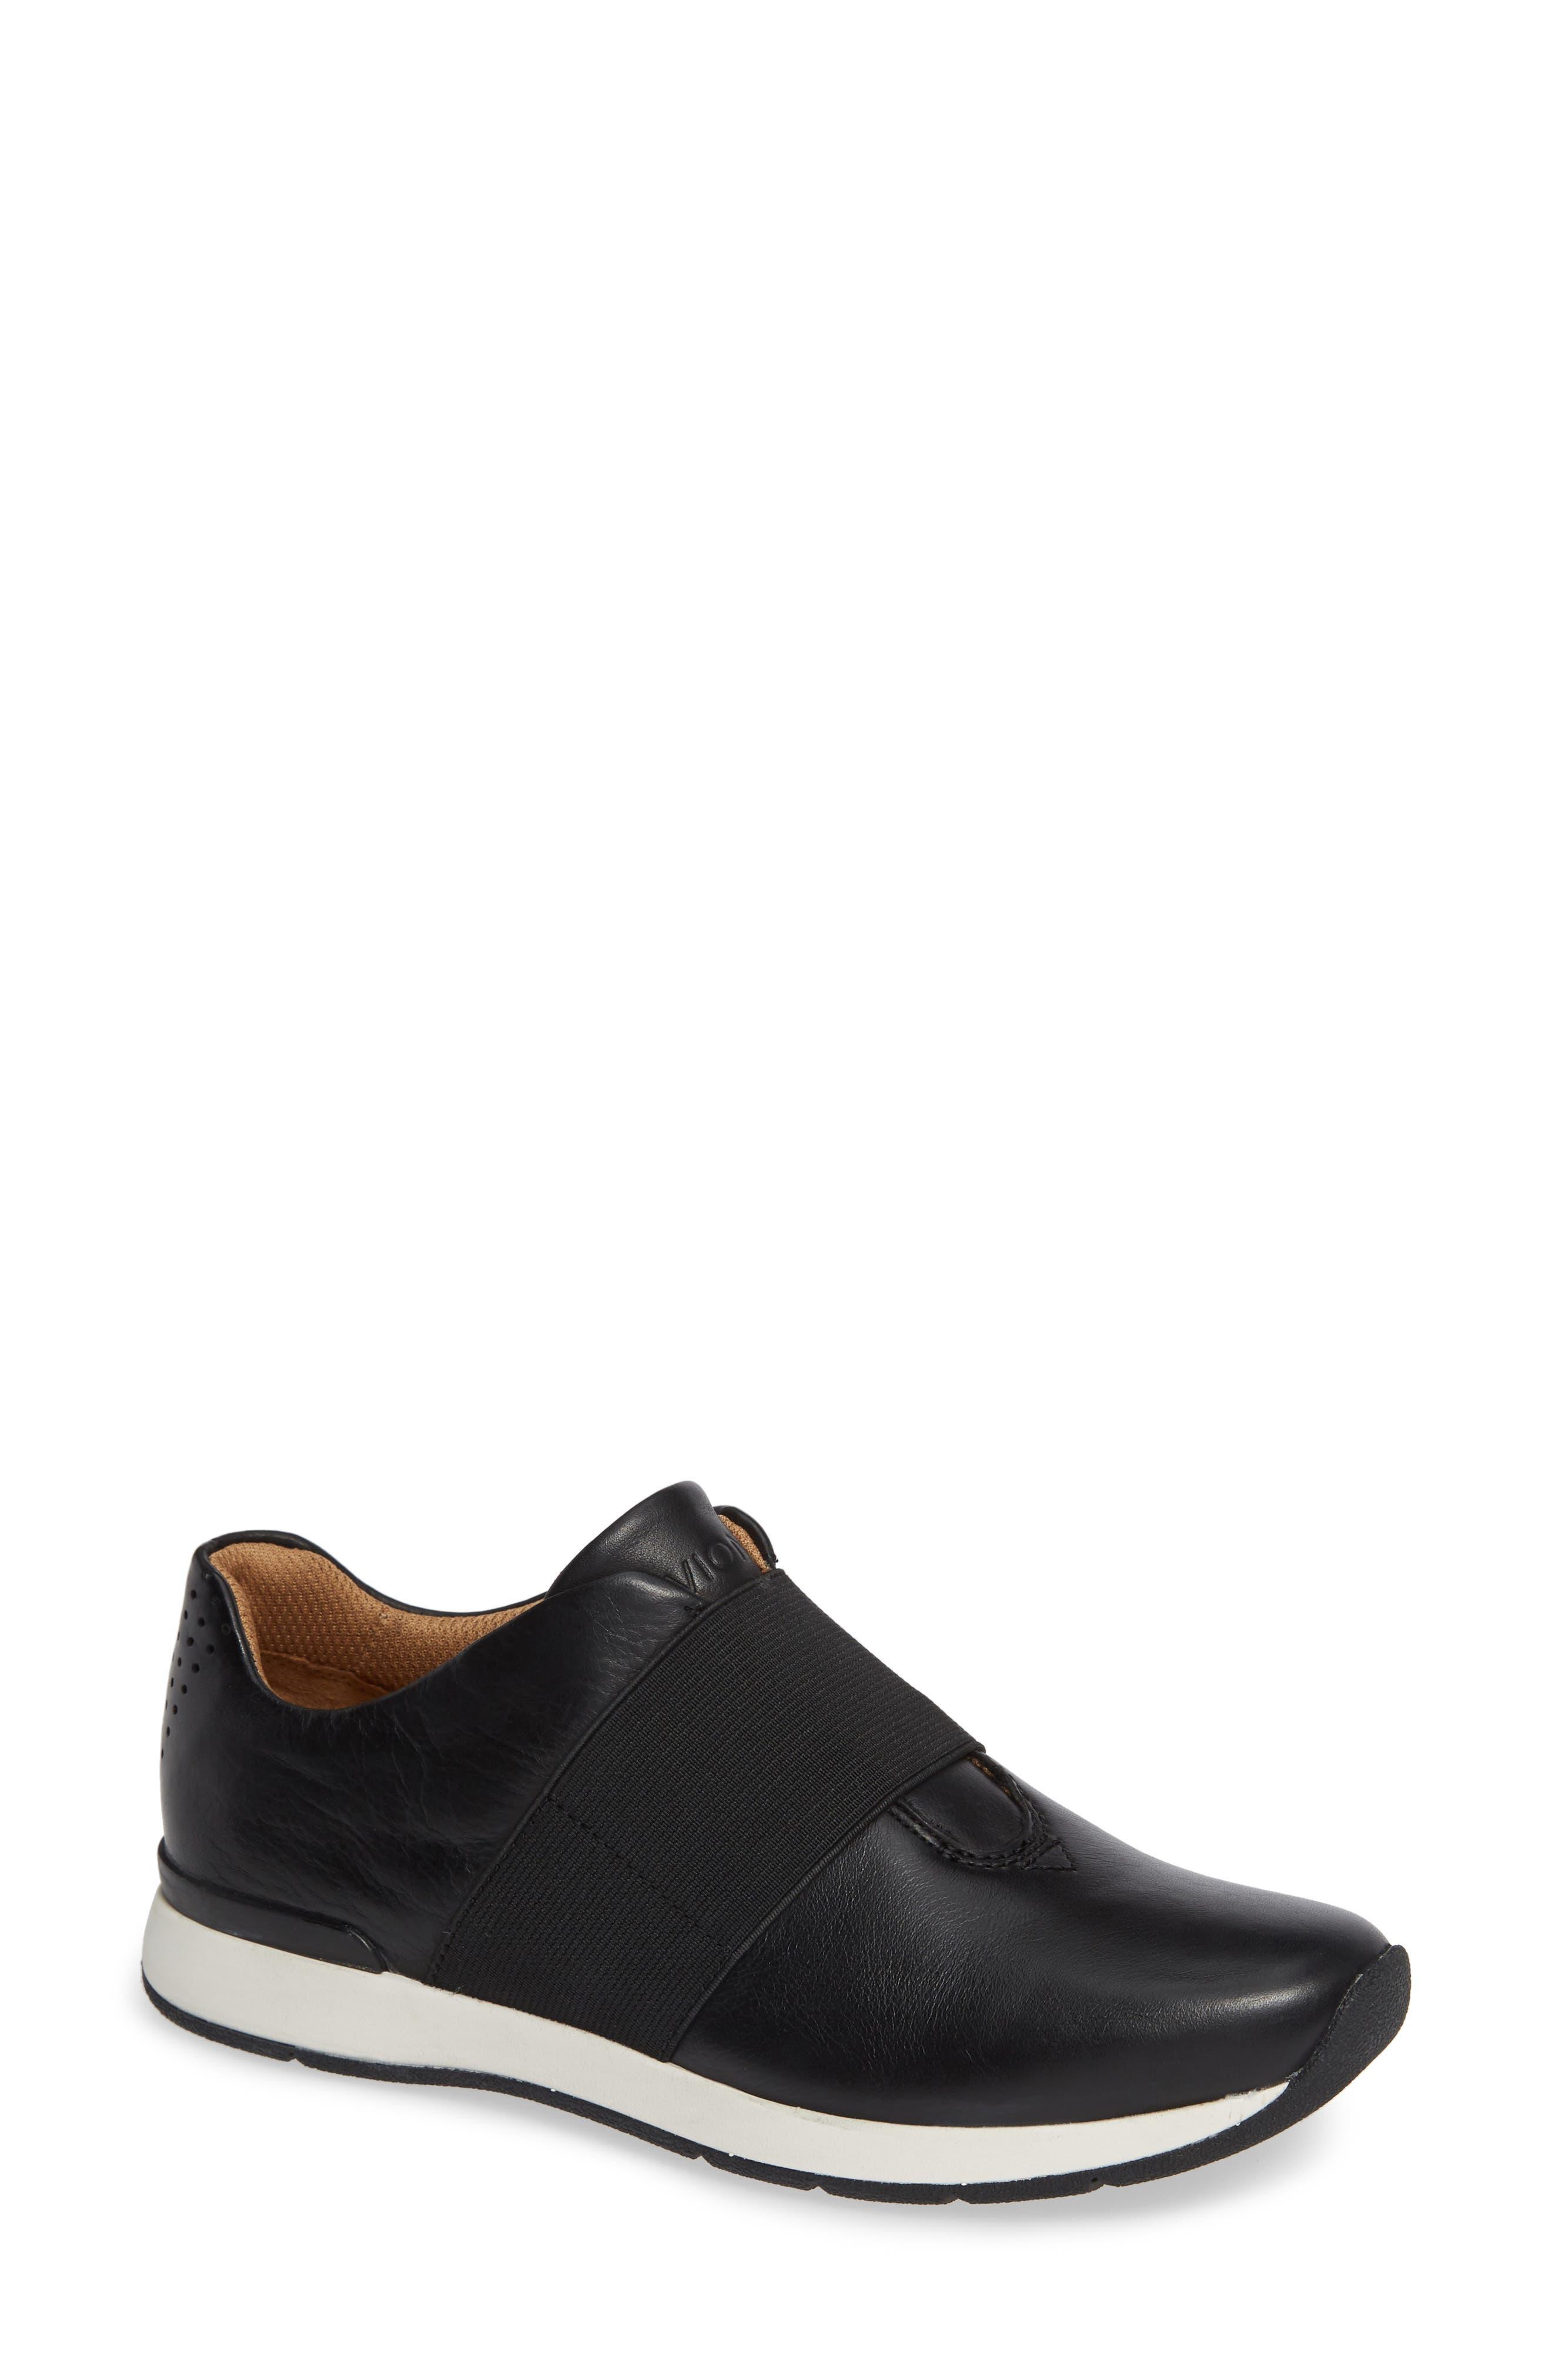 Codie Slip-On Sneaker,                         Main,                         color, BLACK LEATHER